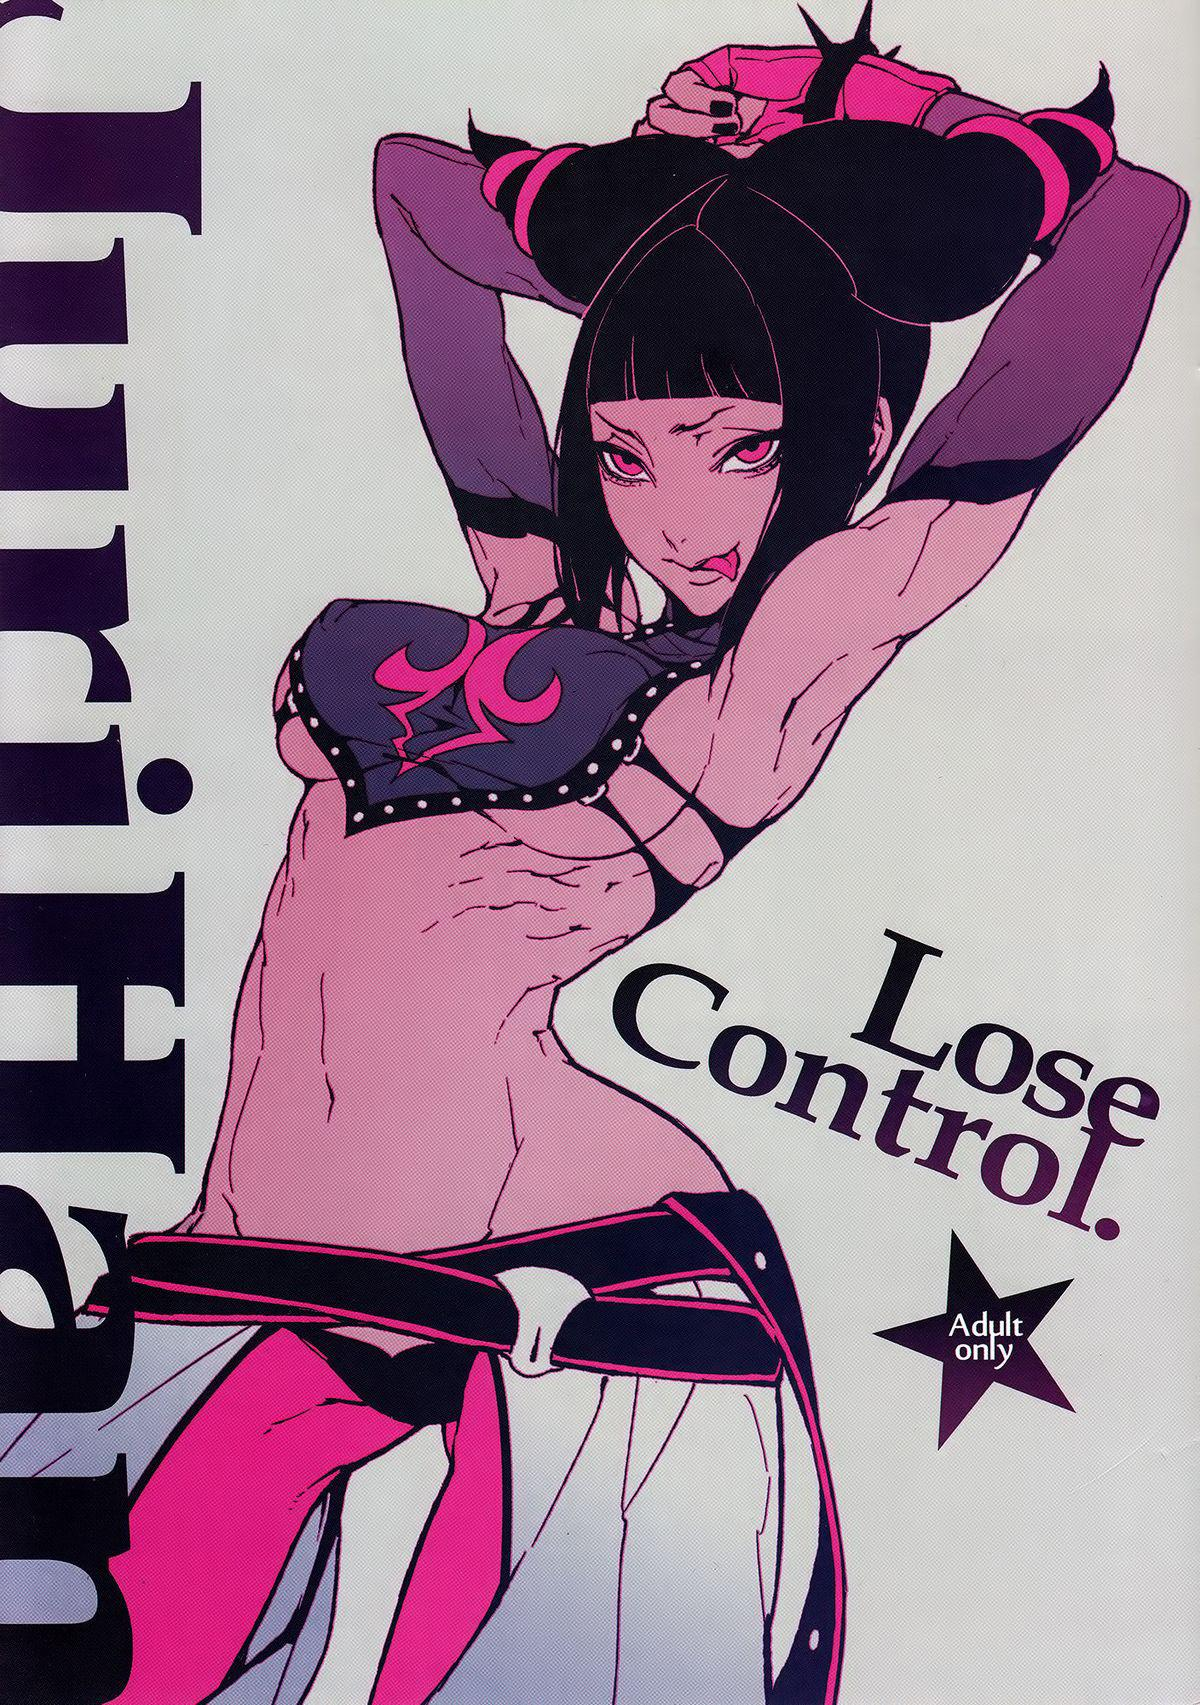 Lose Control 0